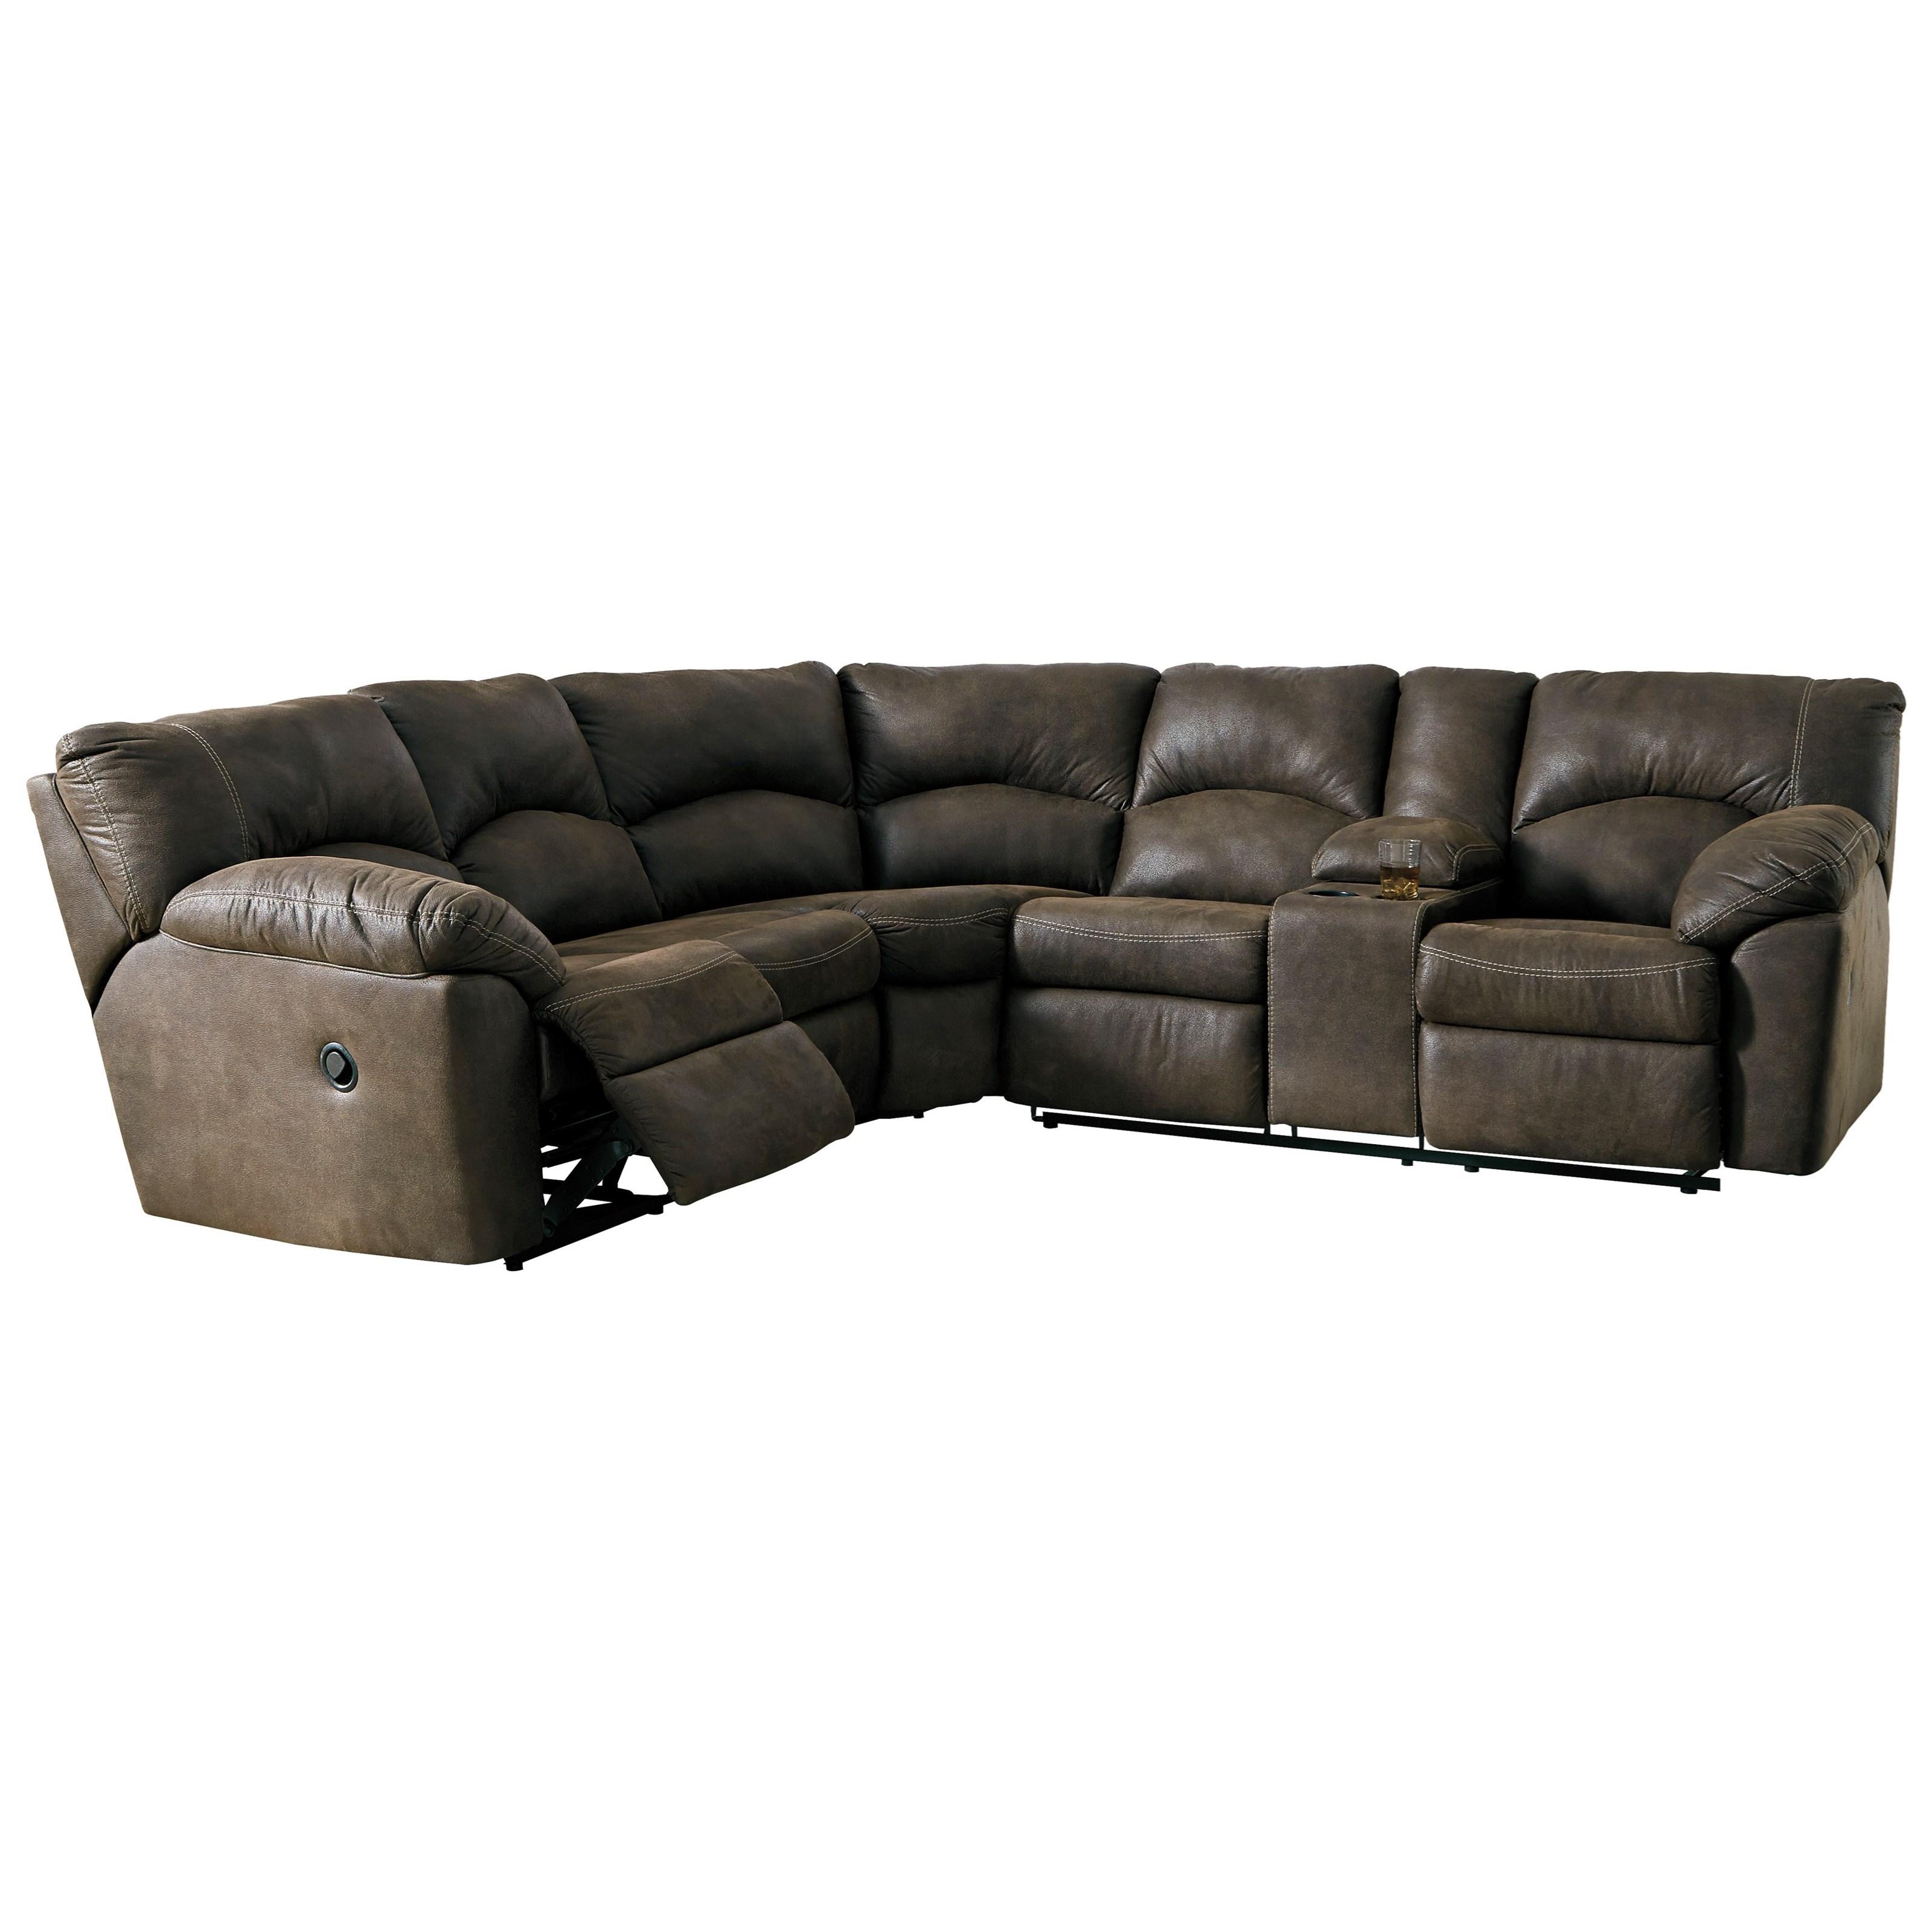 tambo tambo reclining sectional sofa